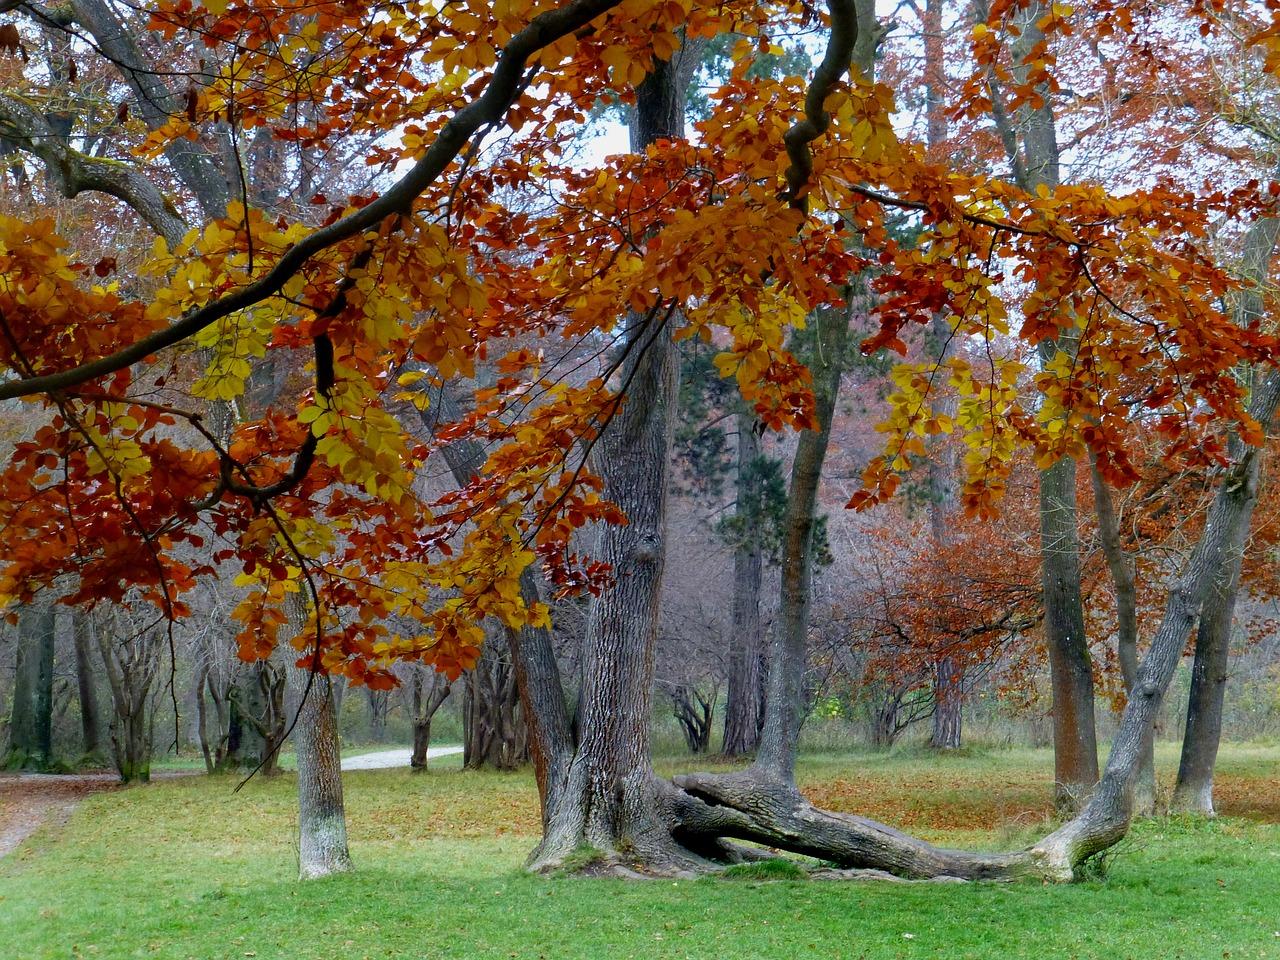 Golden autumn,book,park,english garden,free pictures - free photo ...